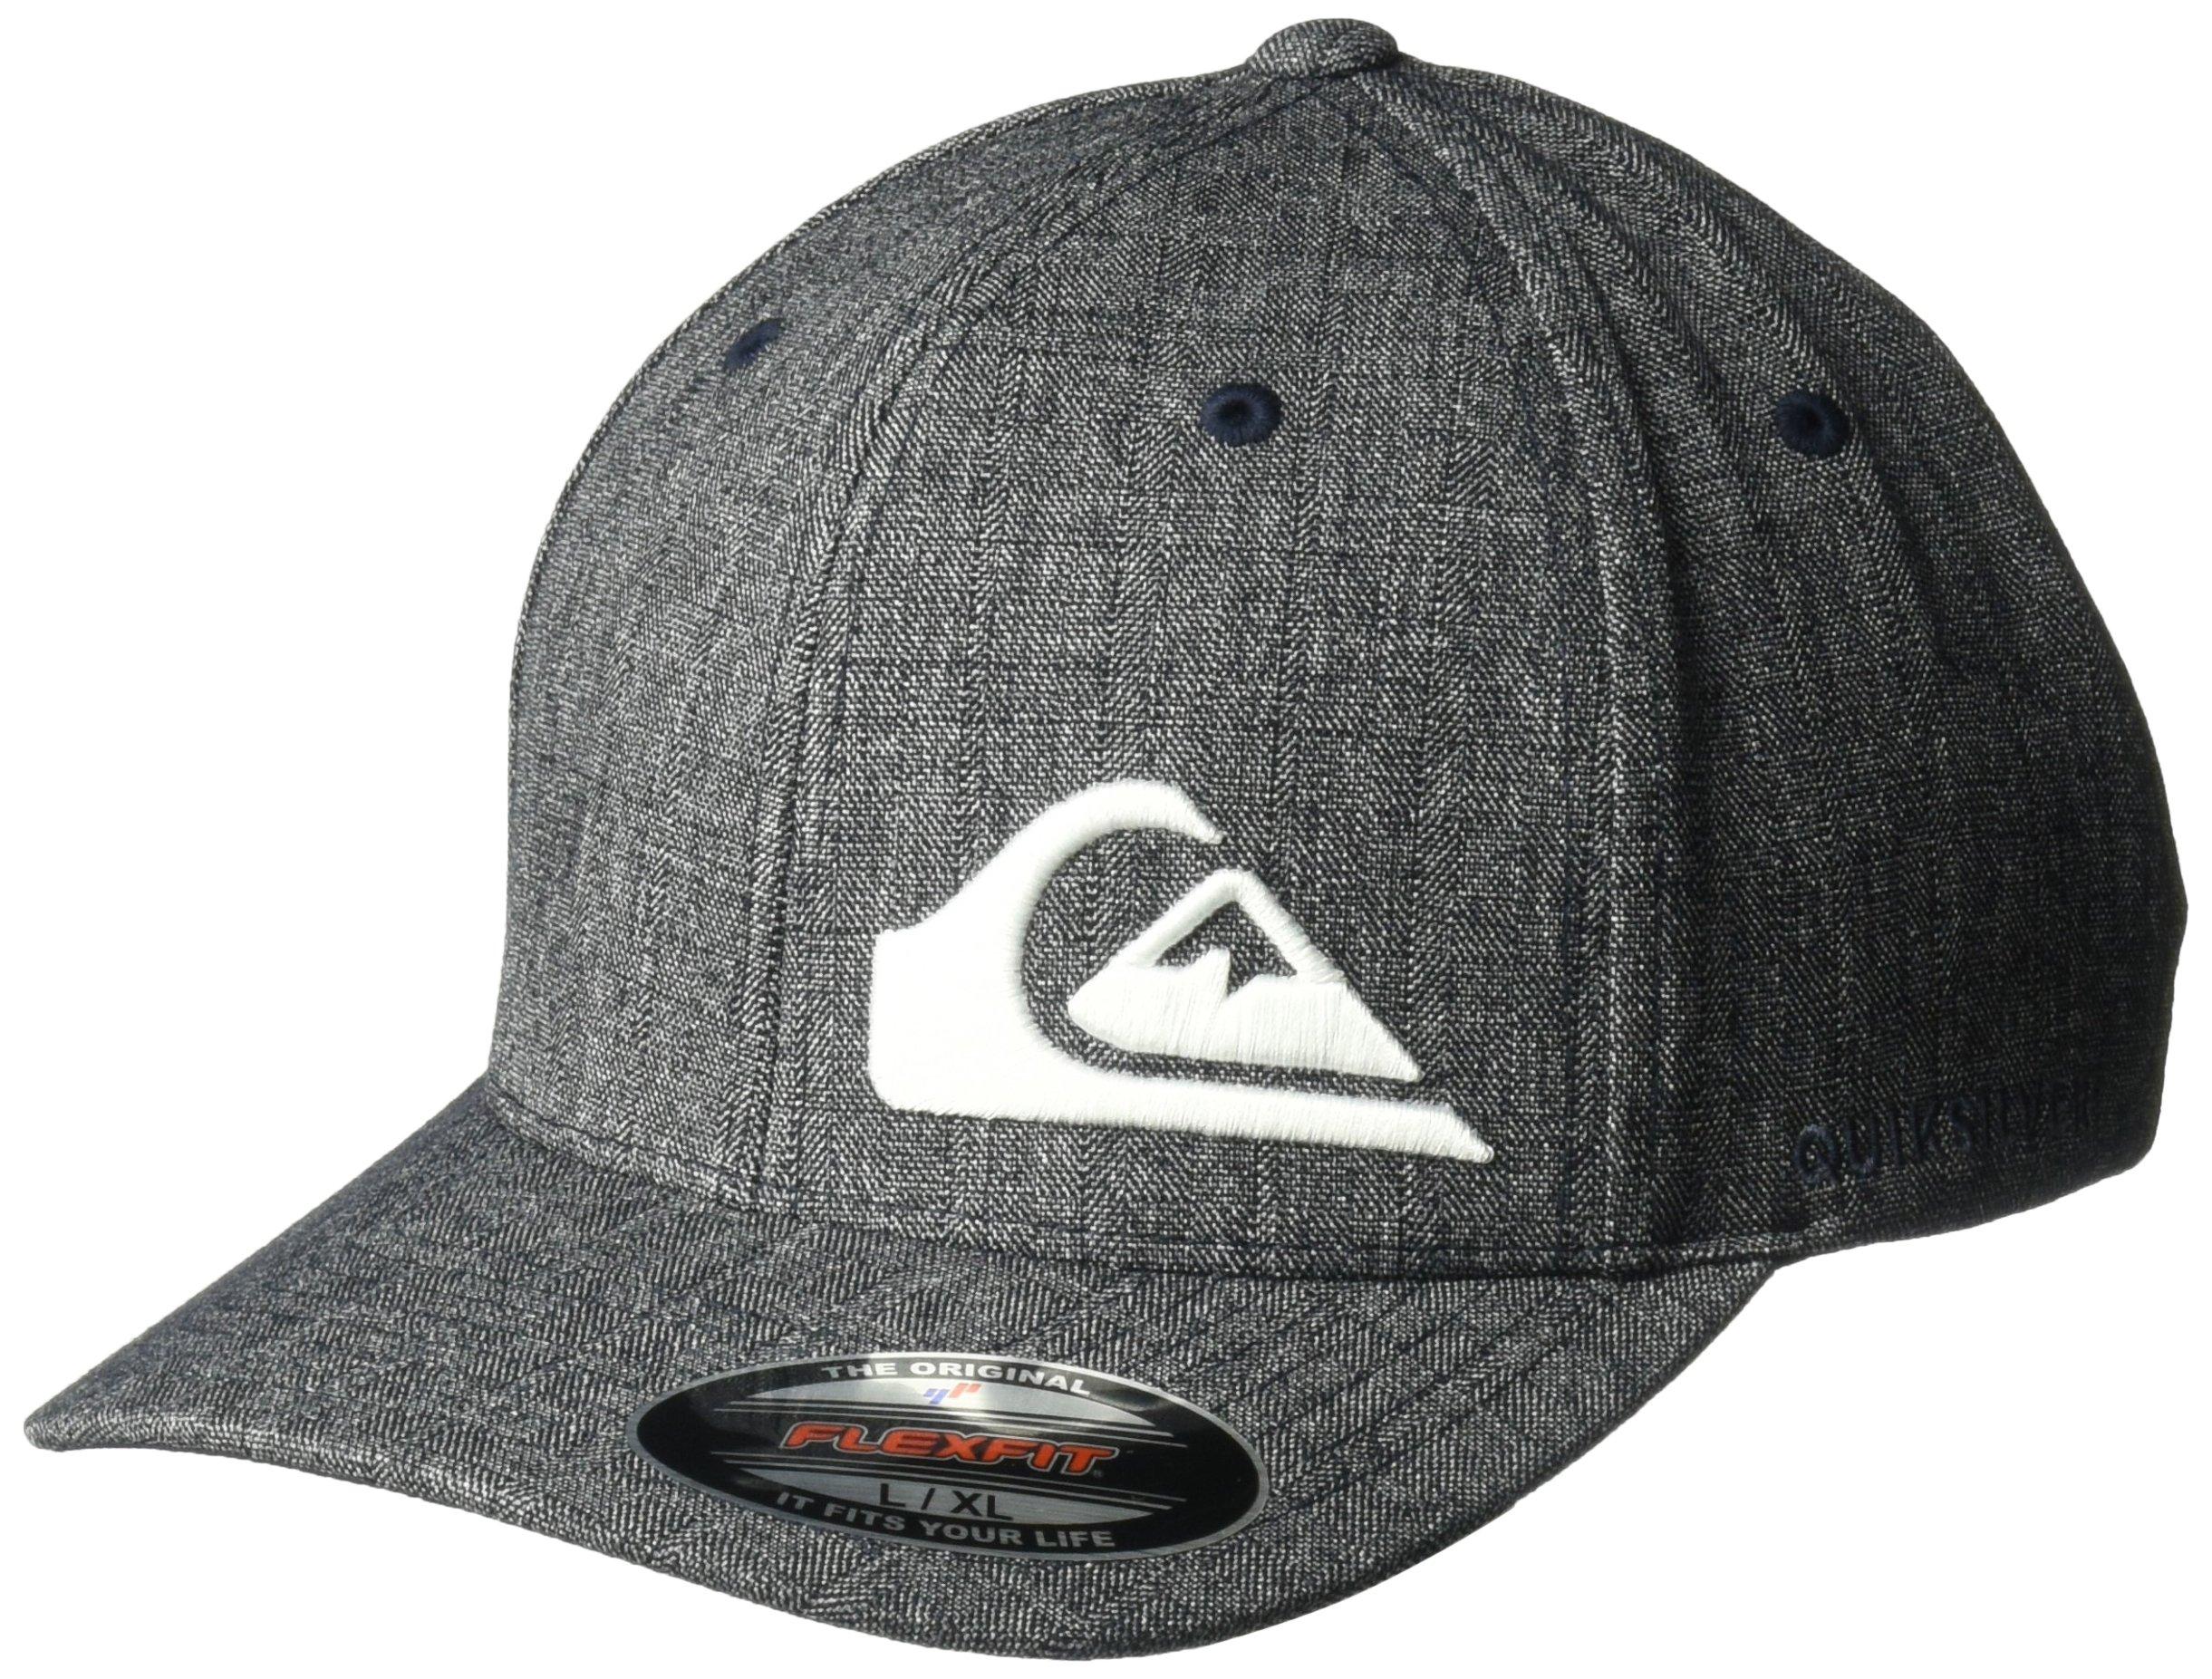 Quiksilver Men's Final Stretch Fit Hat, Navy Blazer Heather, L/XL